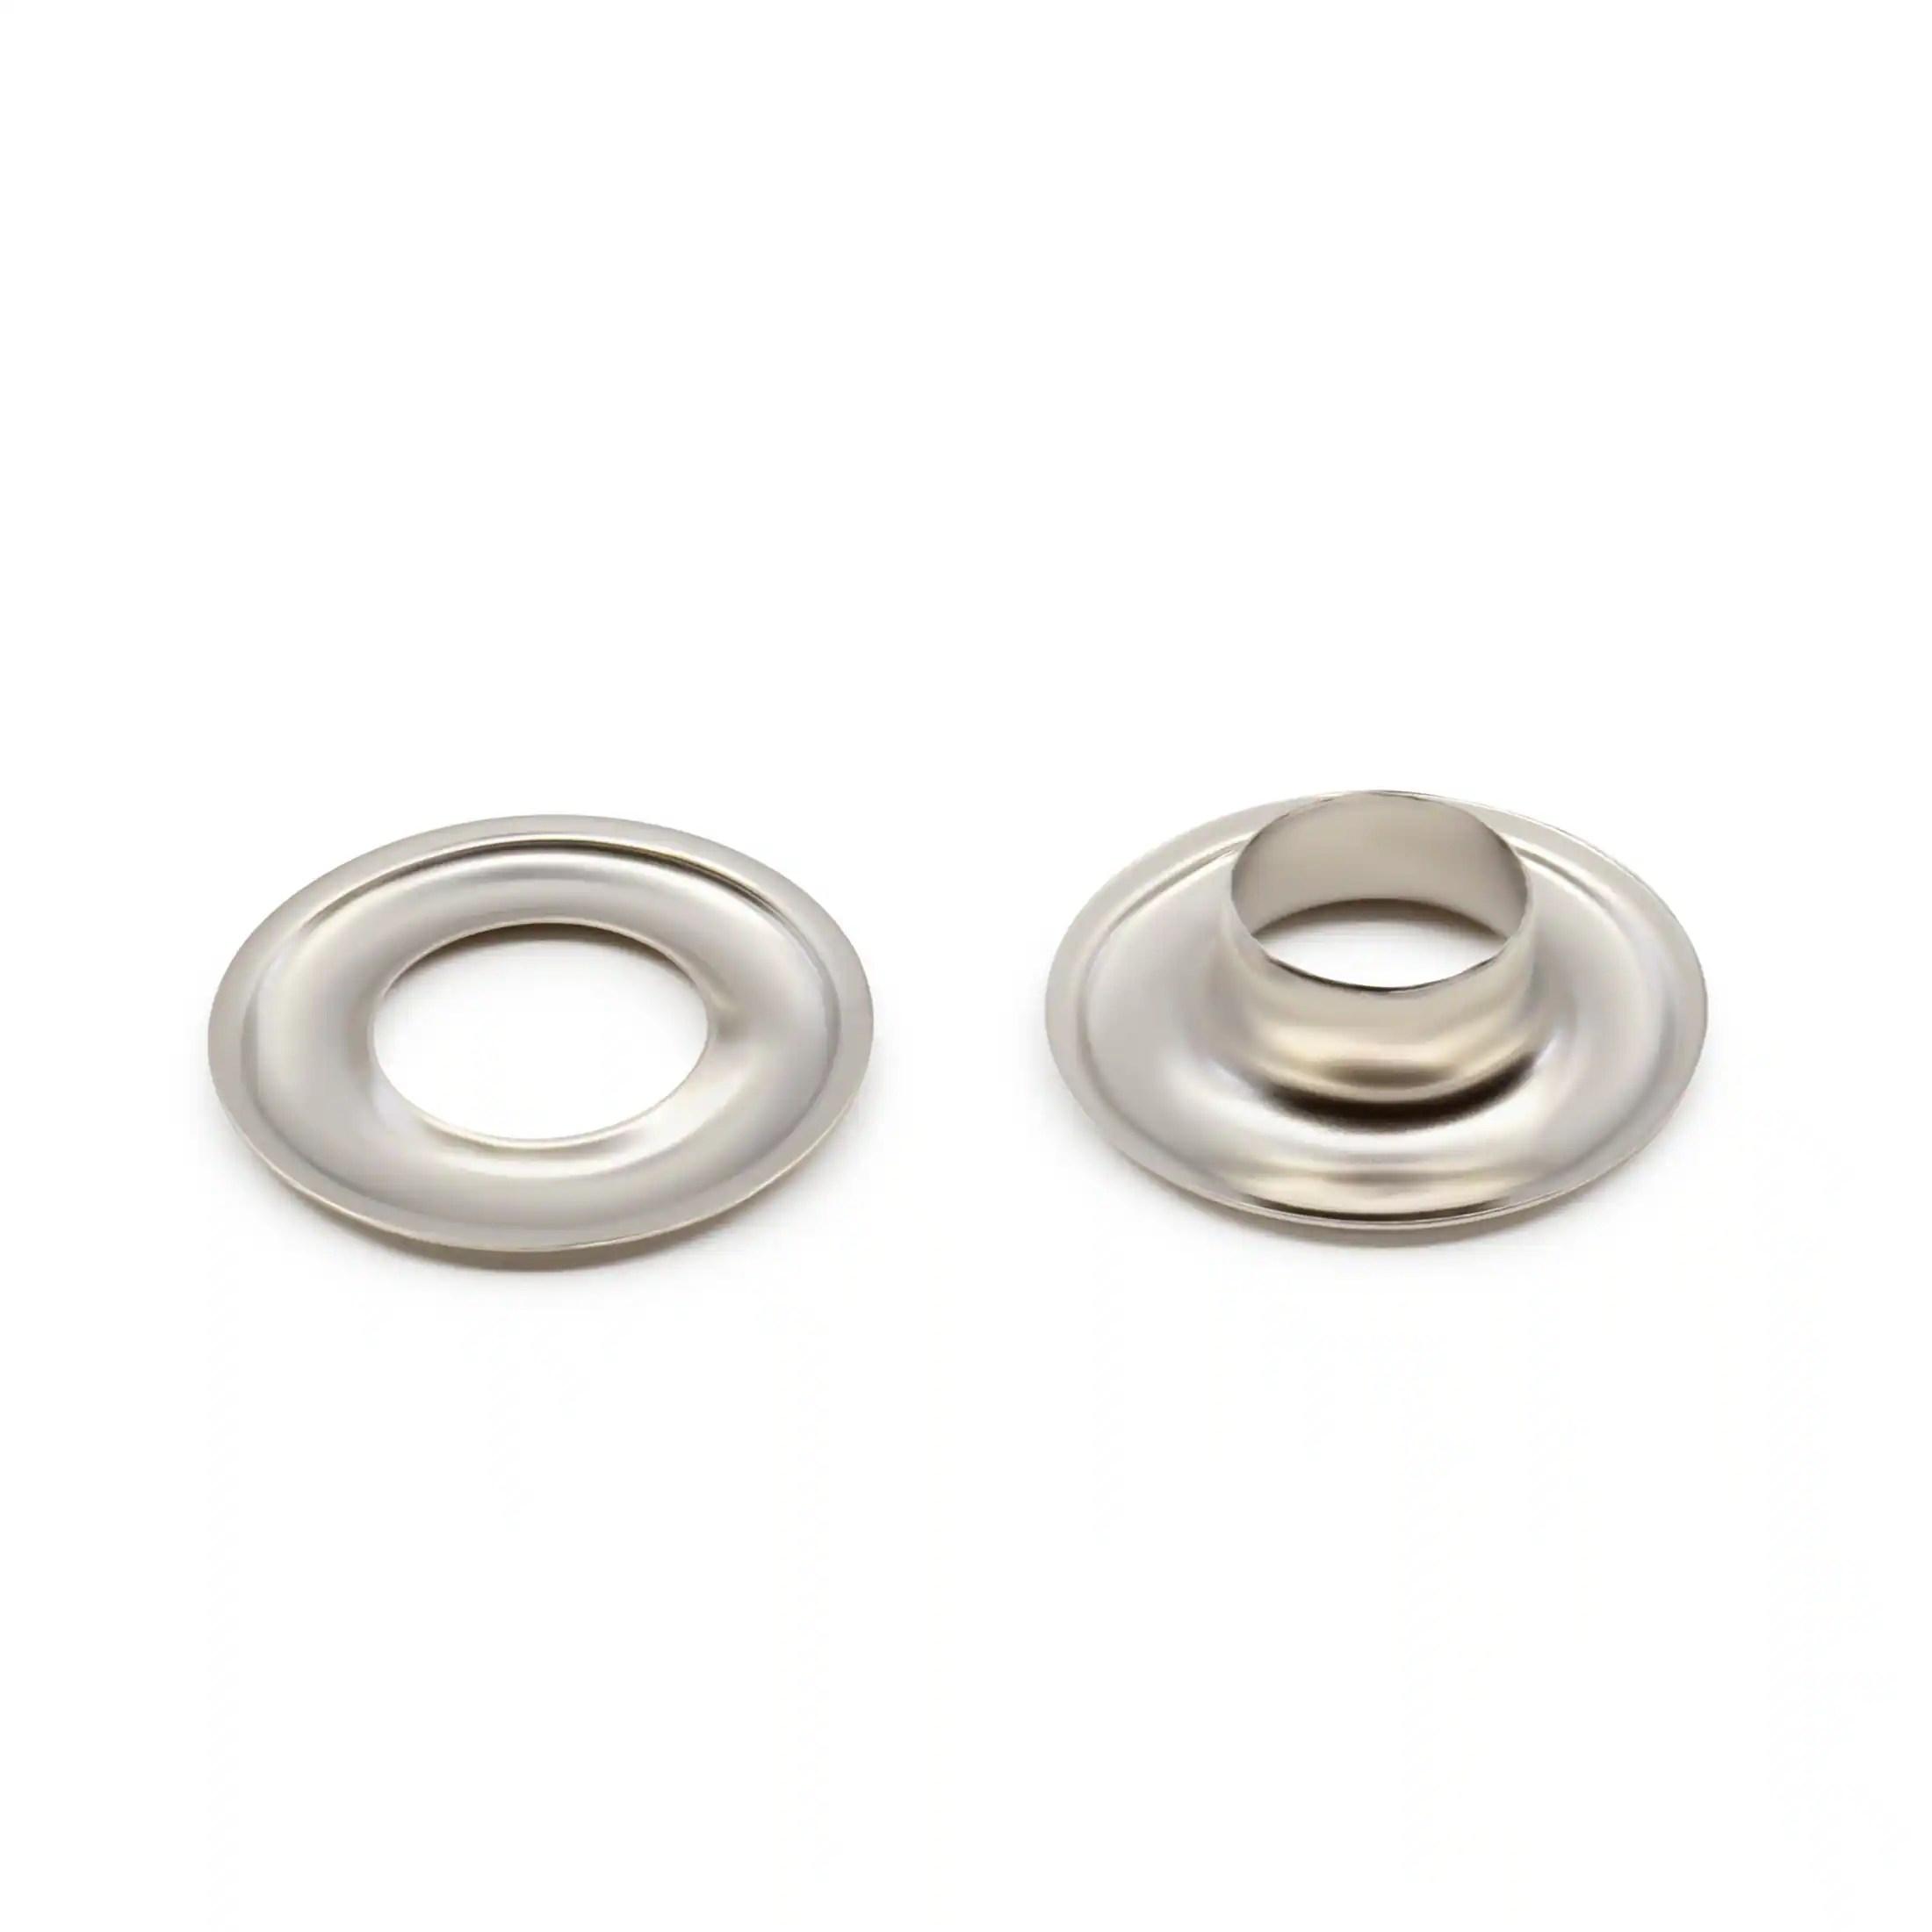 dritz silver 3 8 grommets tools 72 sets